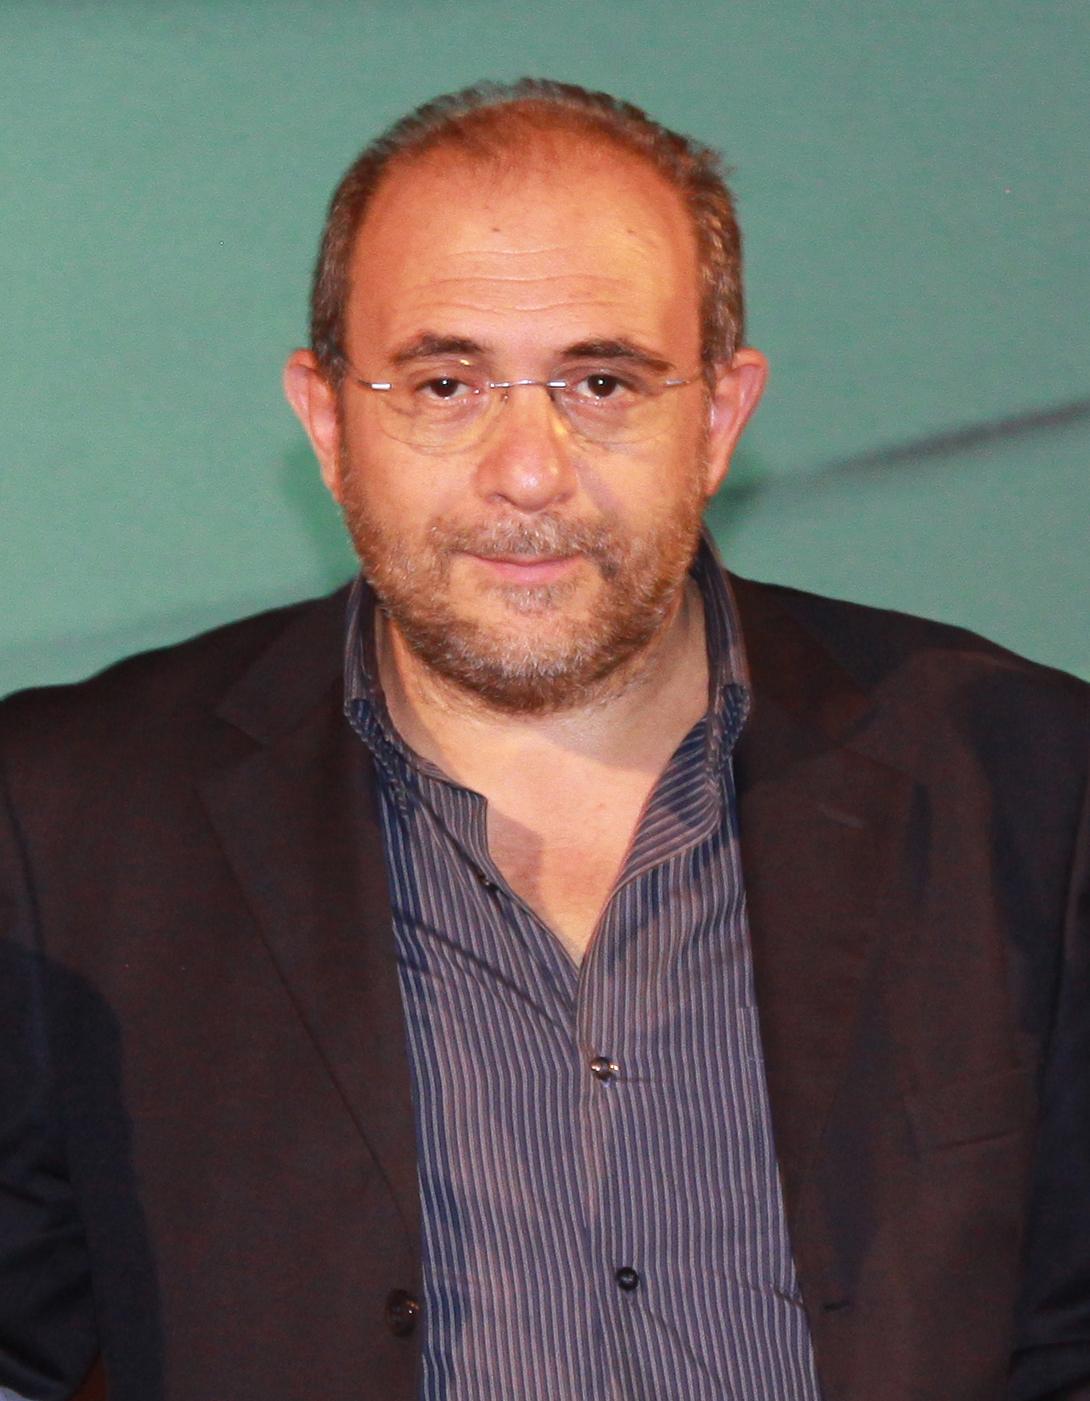 Antonio Barracato